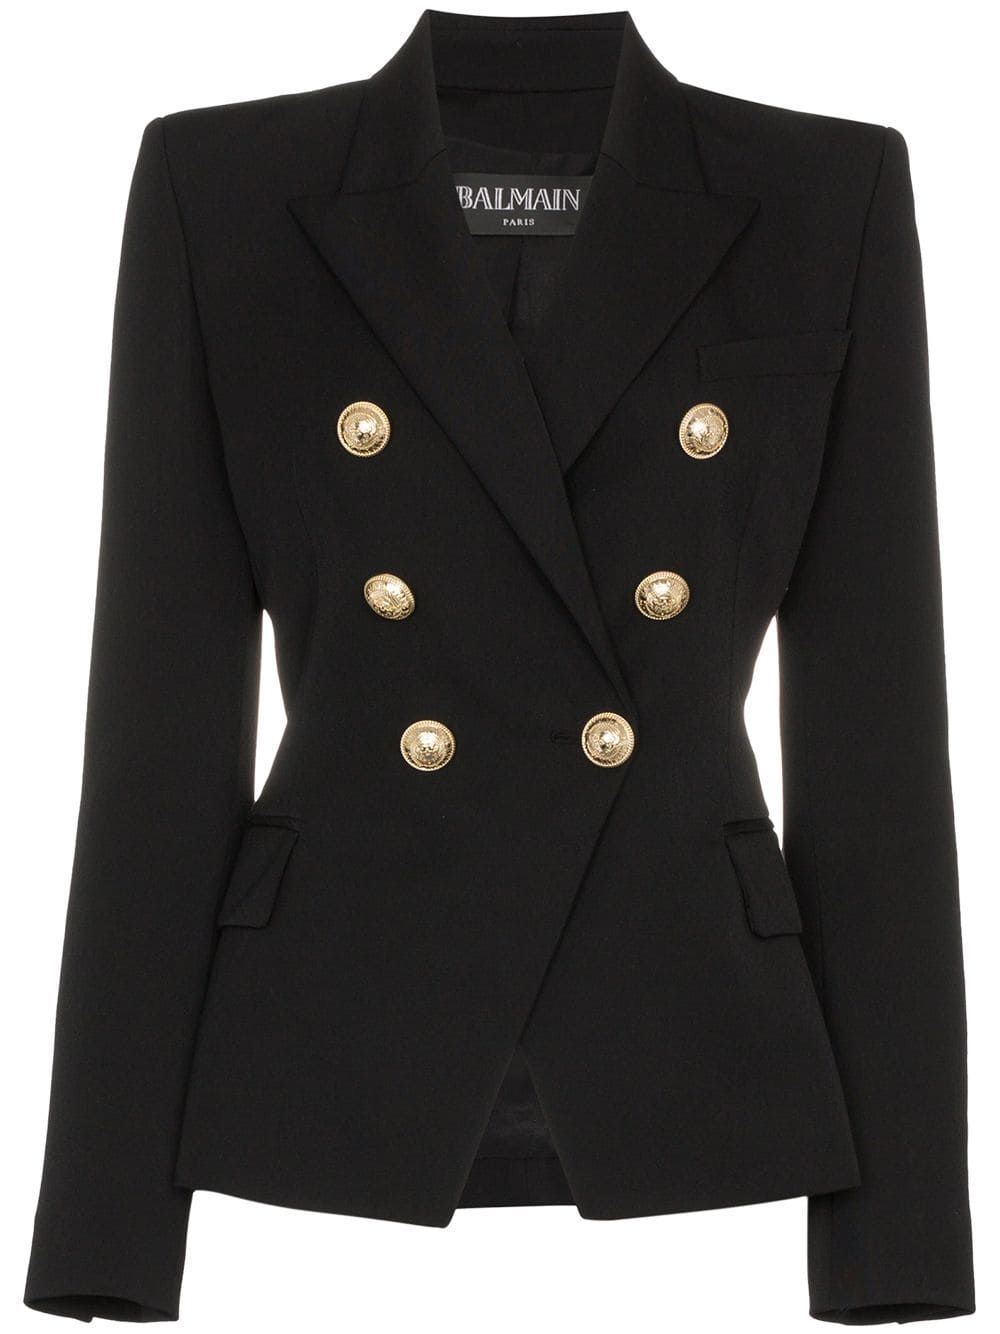 Balmain double breasted blazer Black | Balmain blazer